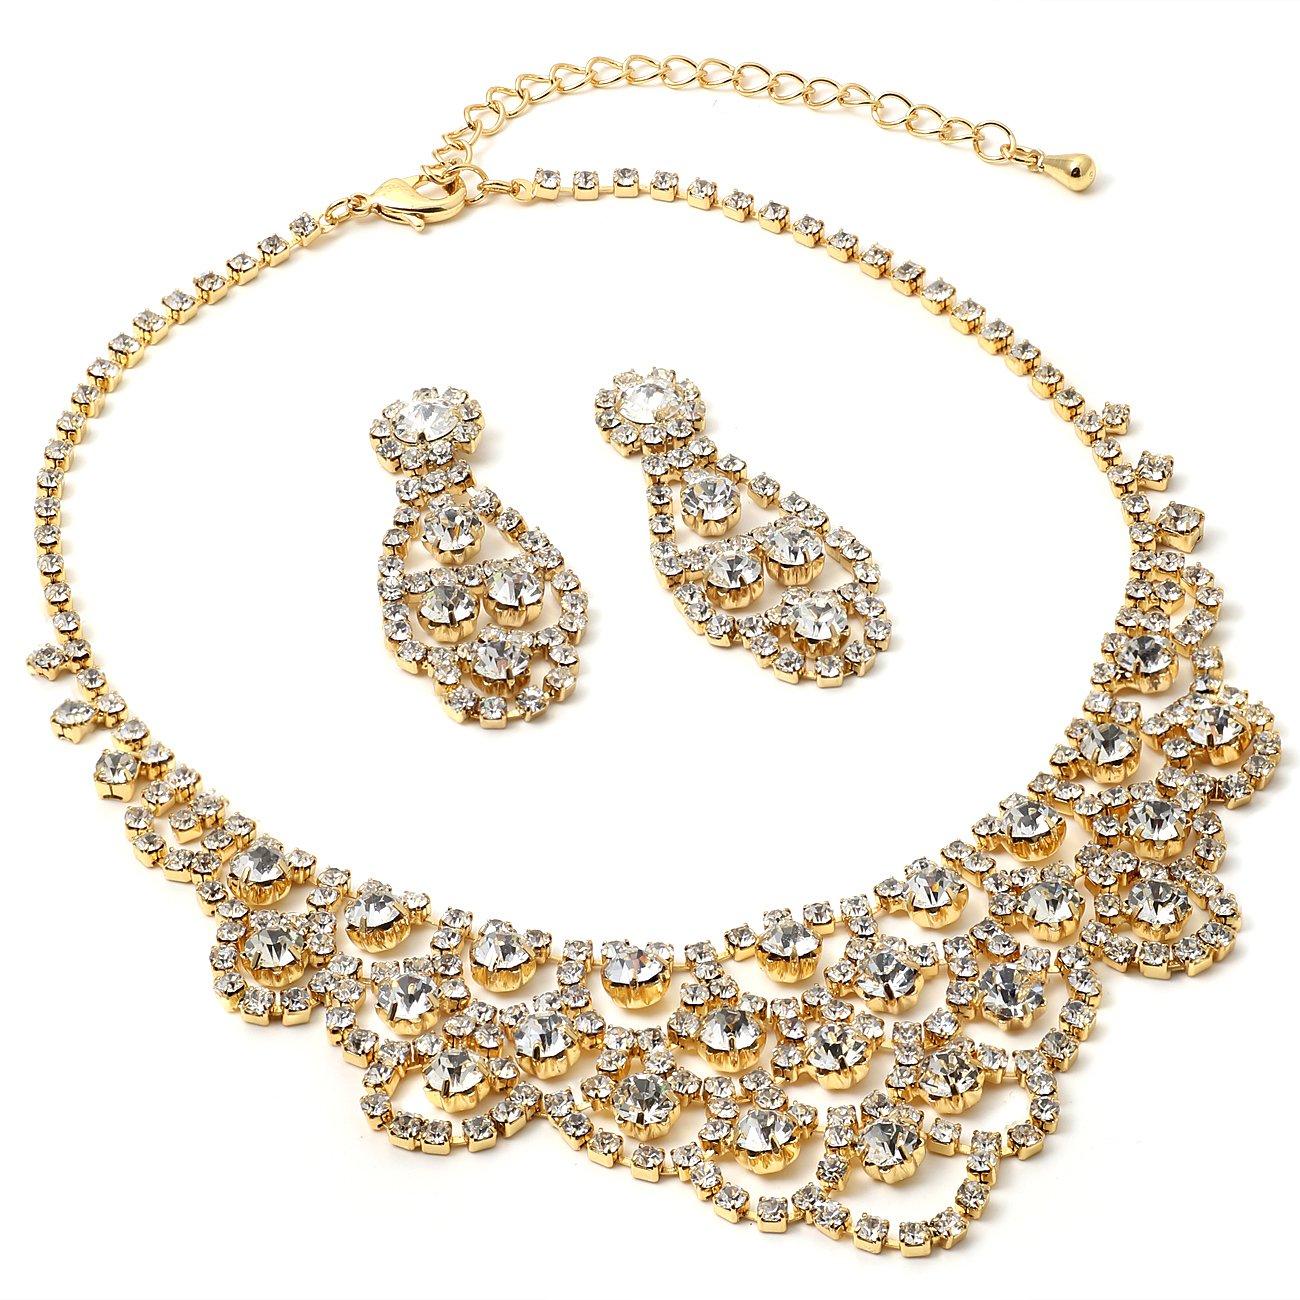 Amazon.com  Gold Crystal Rhinestone Chandelier Drop Dangle Earrings    Chandelier Wave Shaped Necklace Jewelry Set  Jewelry f31d1bc565f5